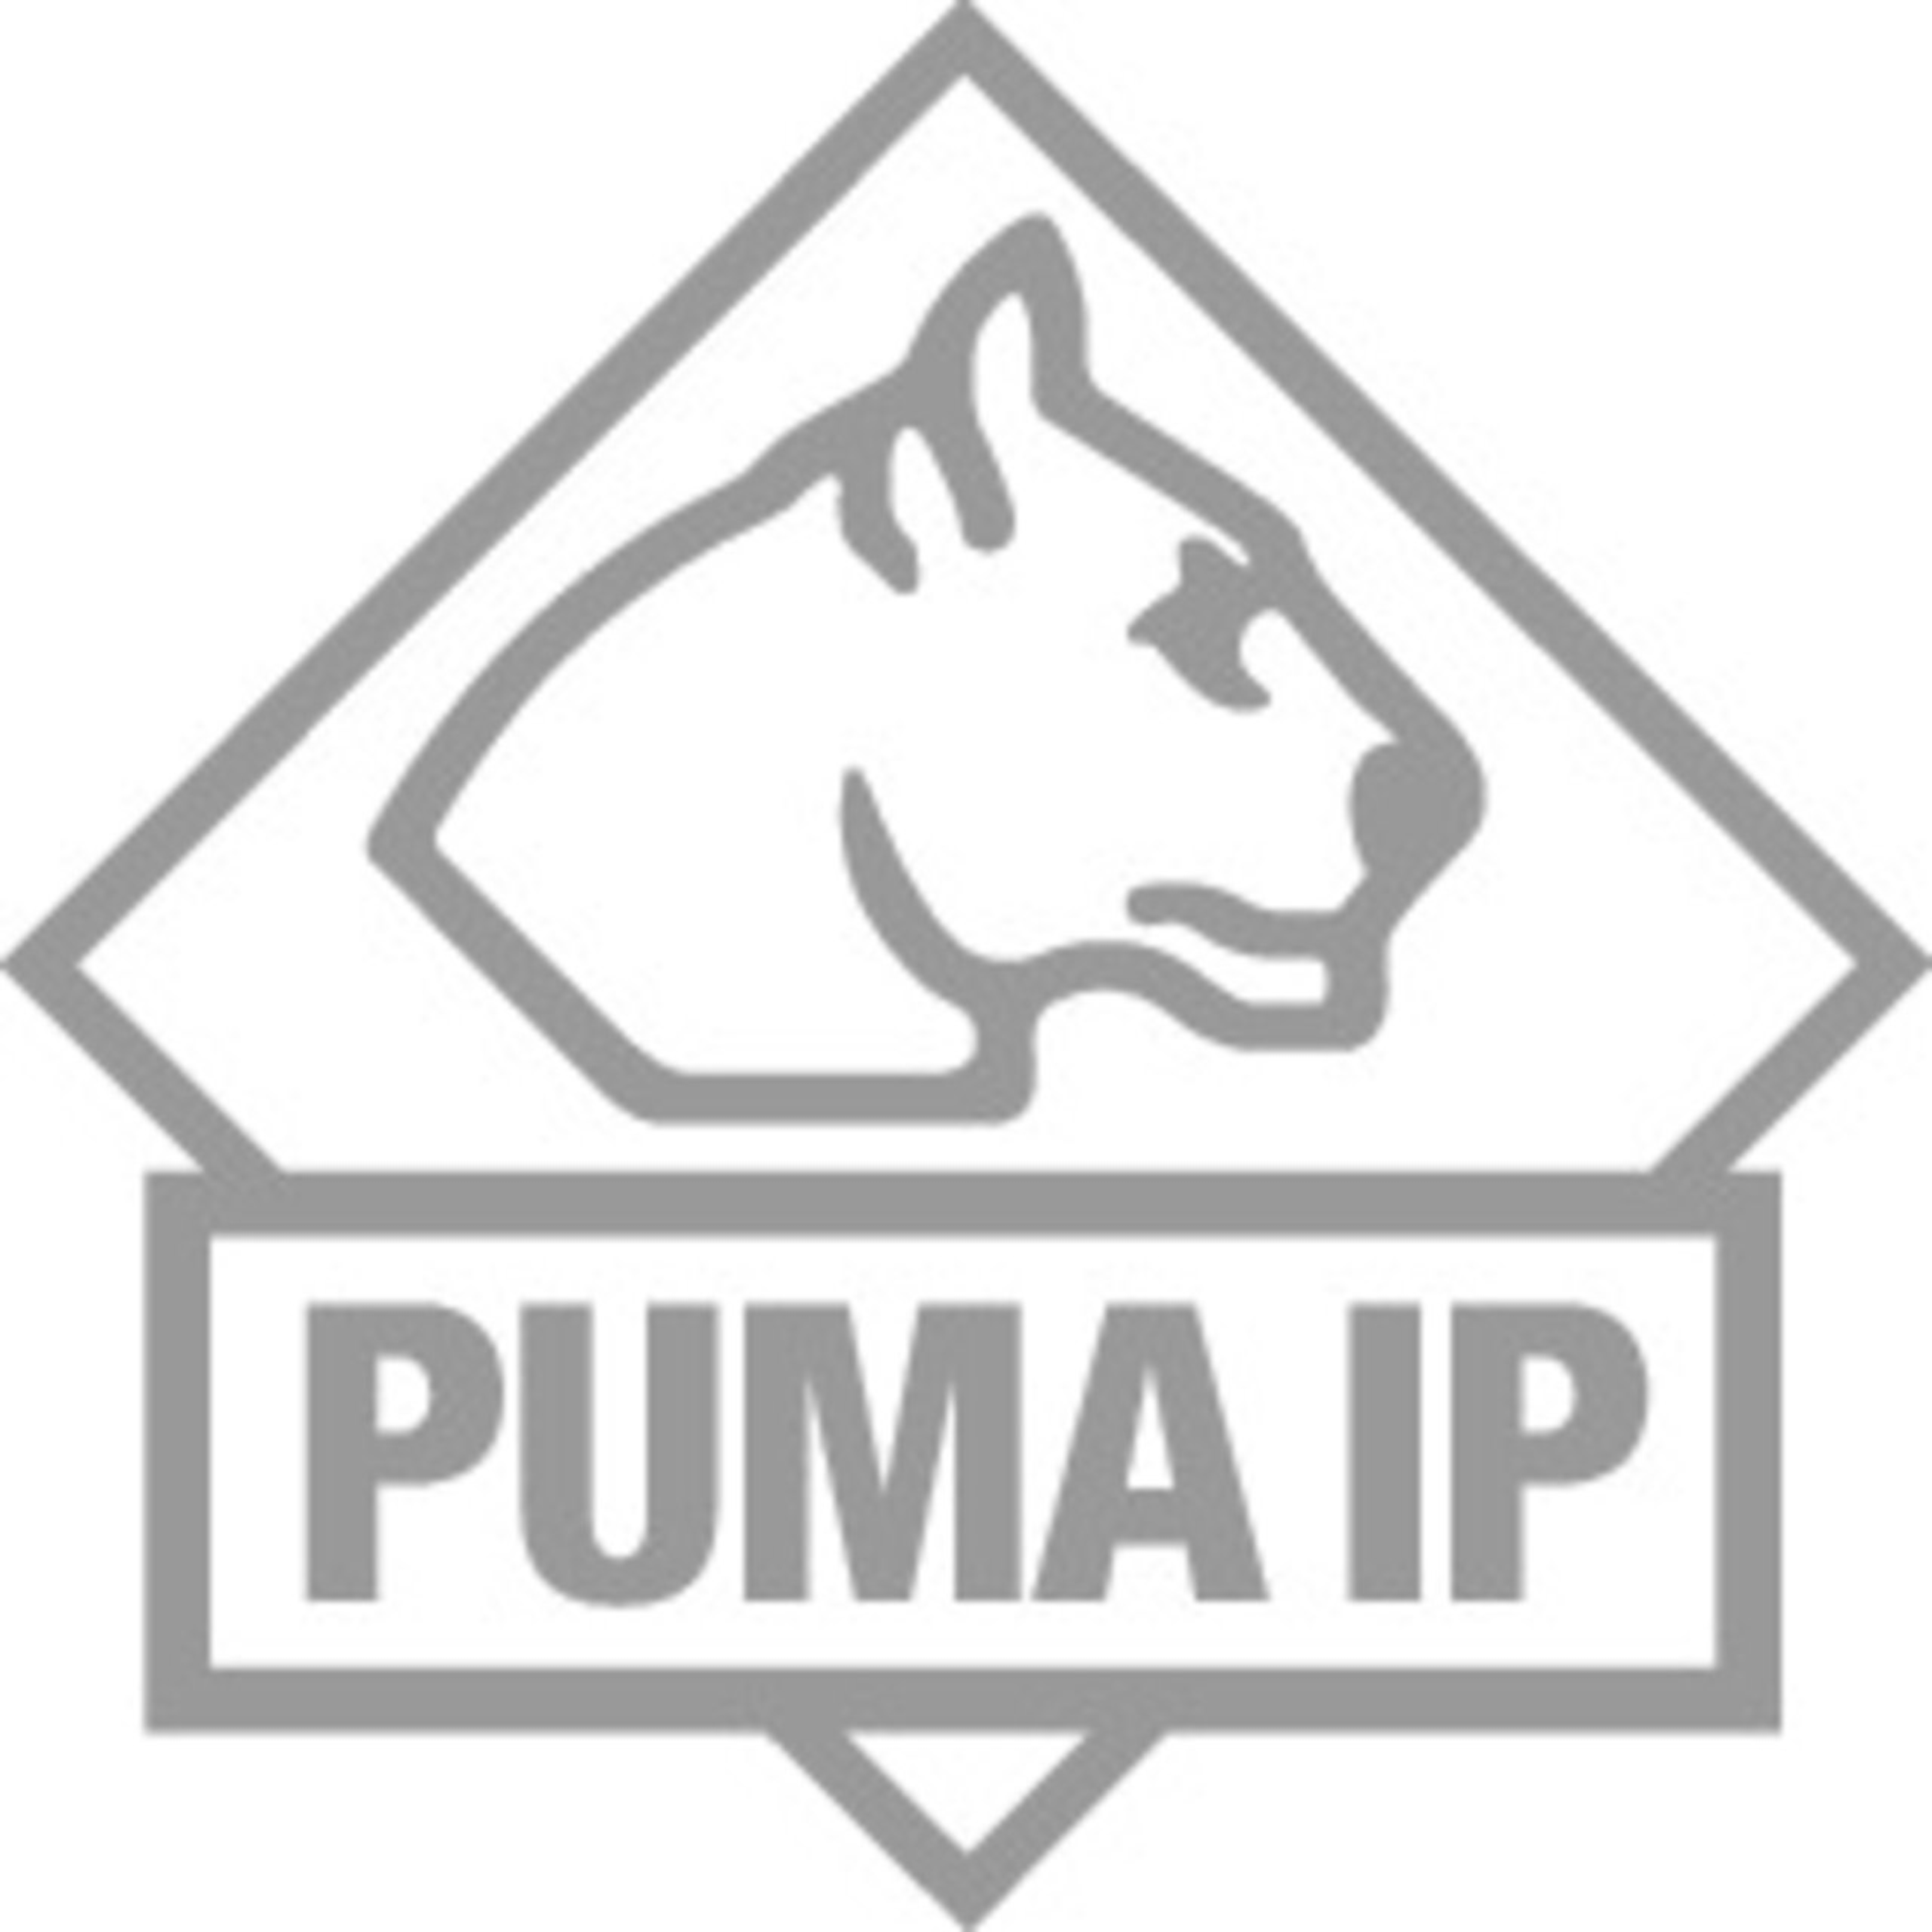 Puma IP